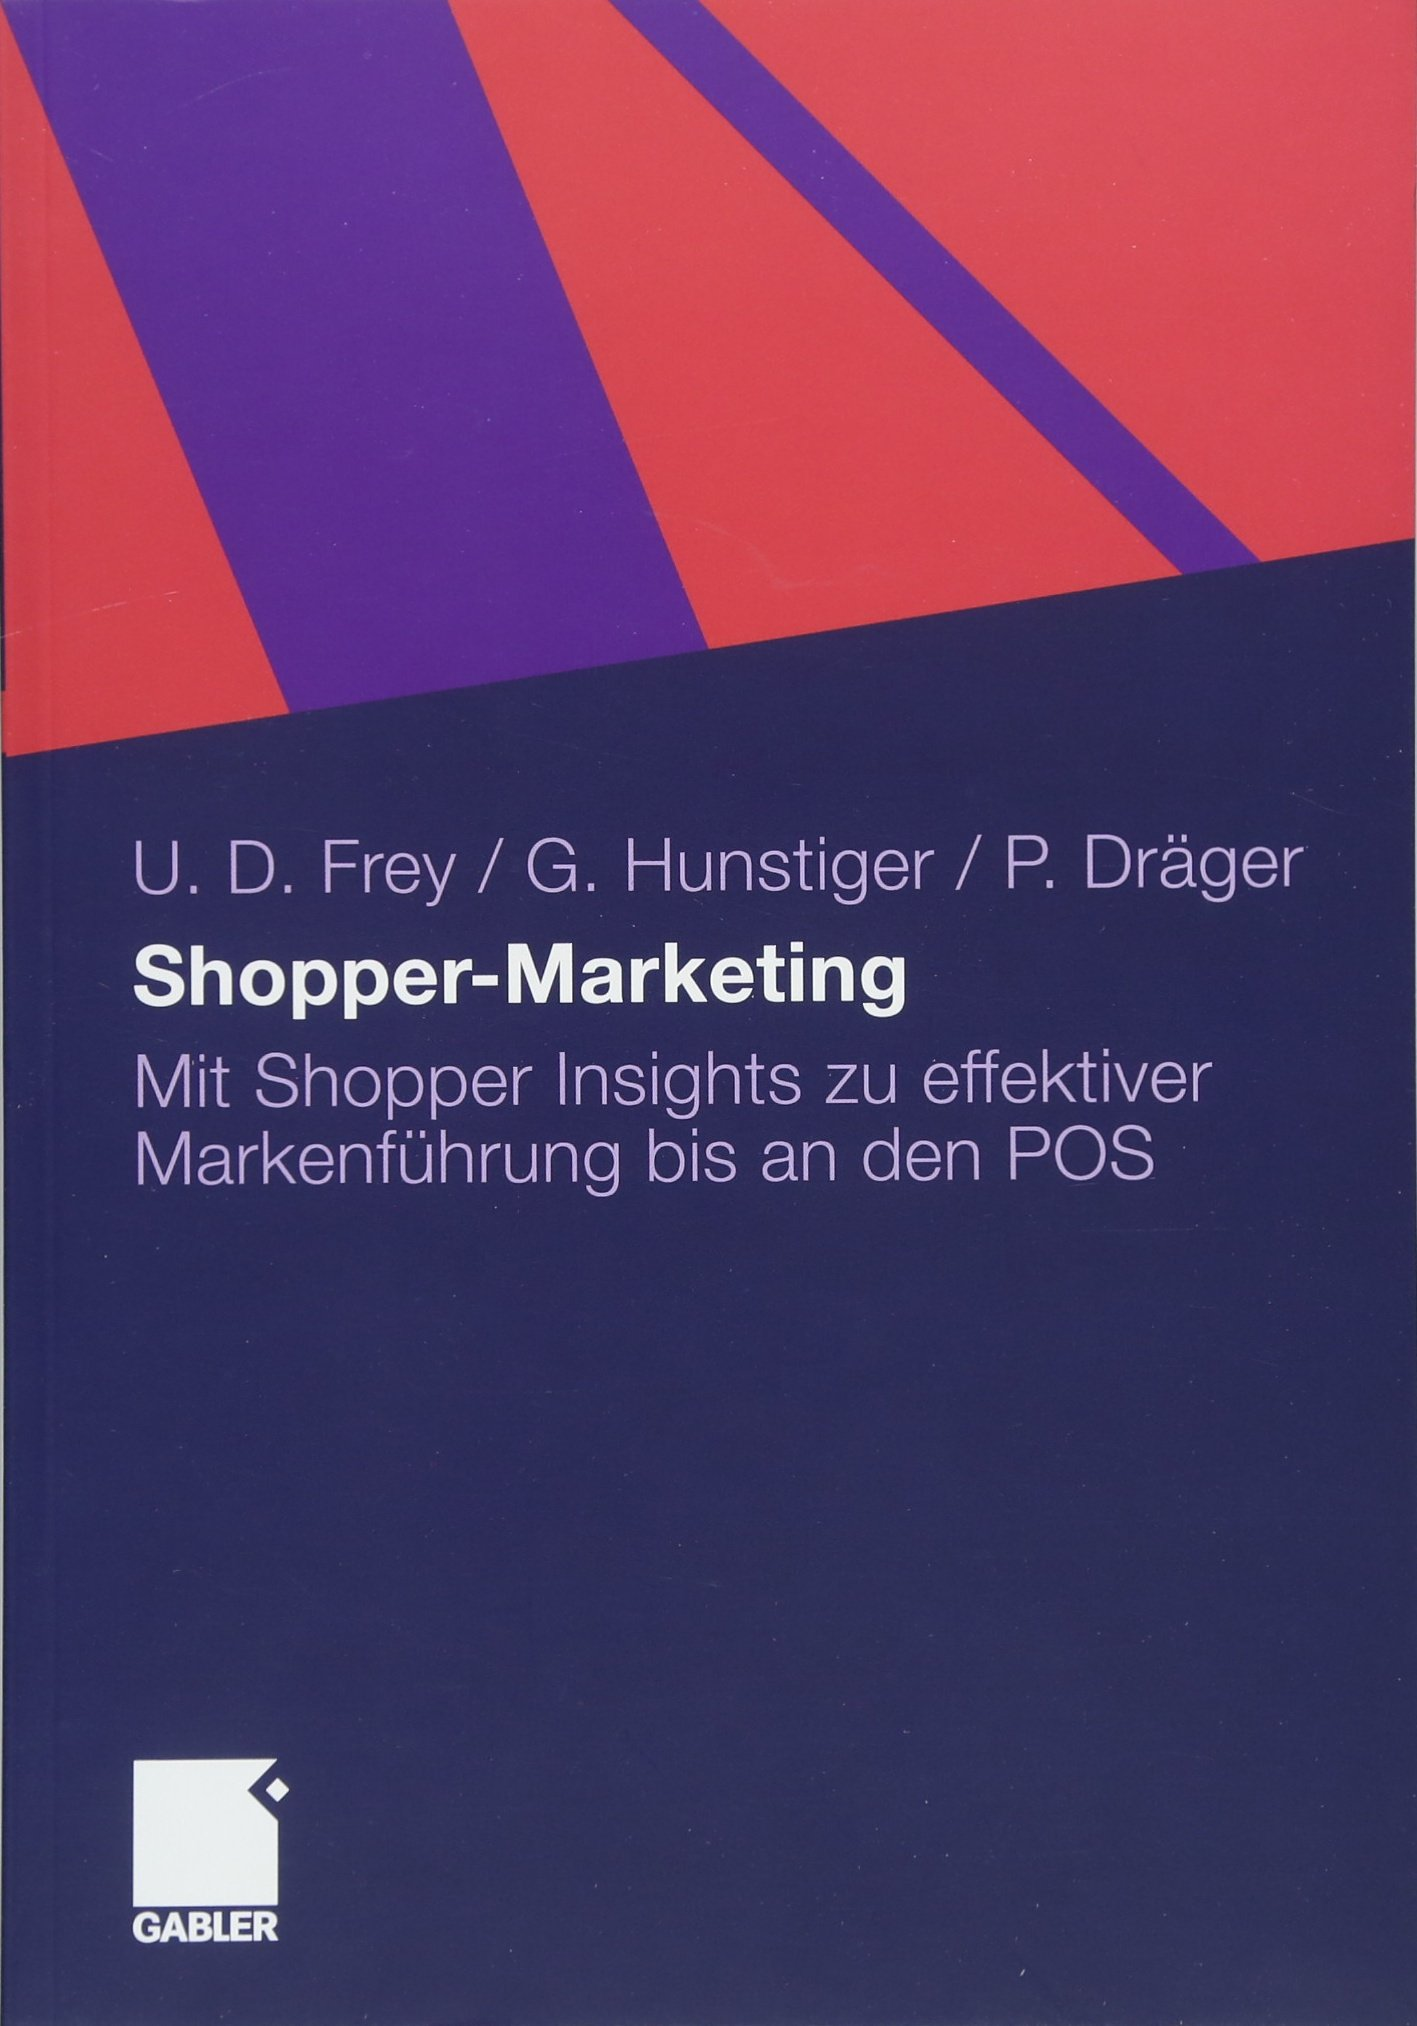 Shopper-Marketing: Mit Shopper Insights zu effektiver Markenführung bis an den POS (German Edition)